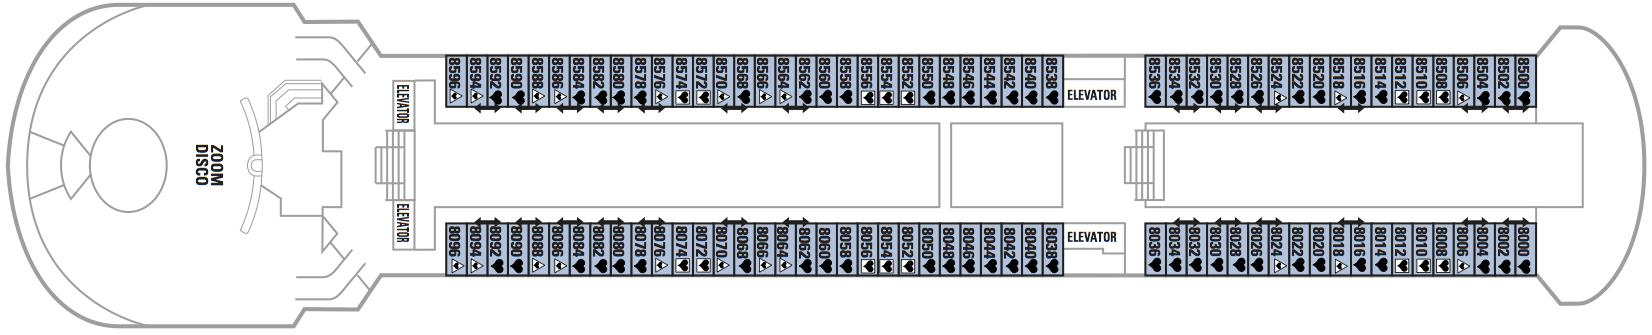 Pullmantur Sovereign Deck Plans Deck 8.jpg